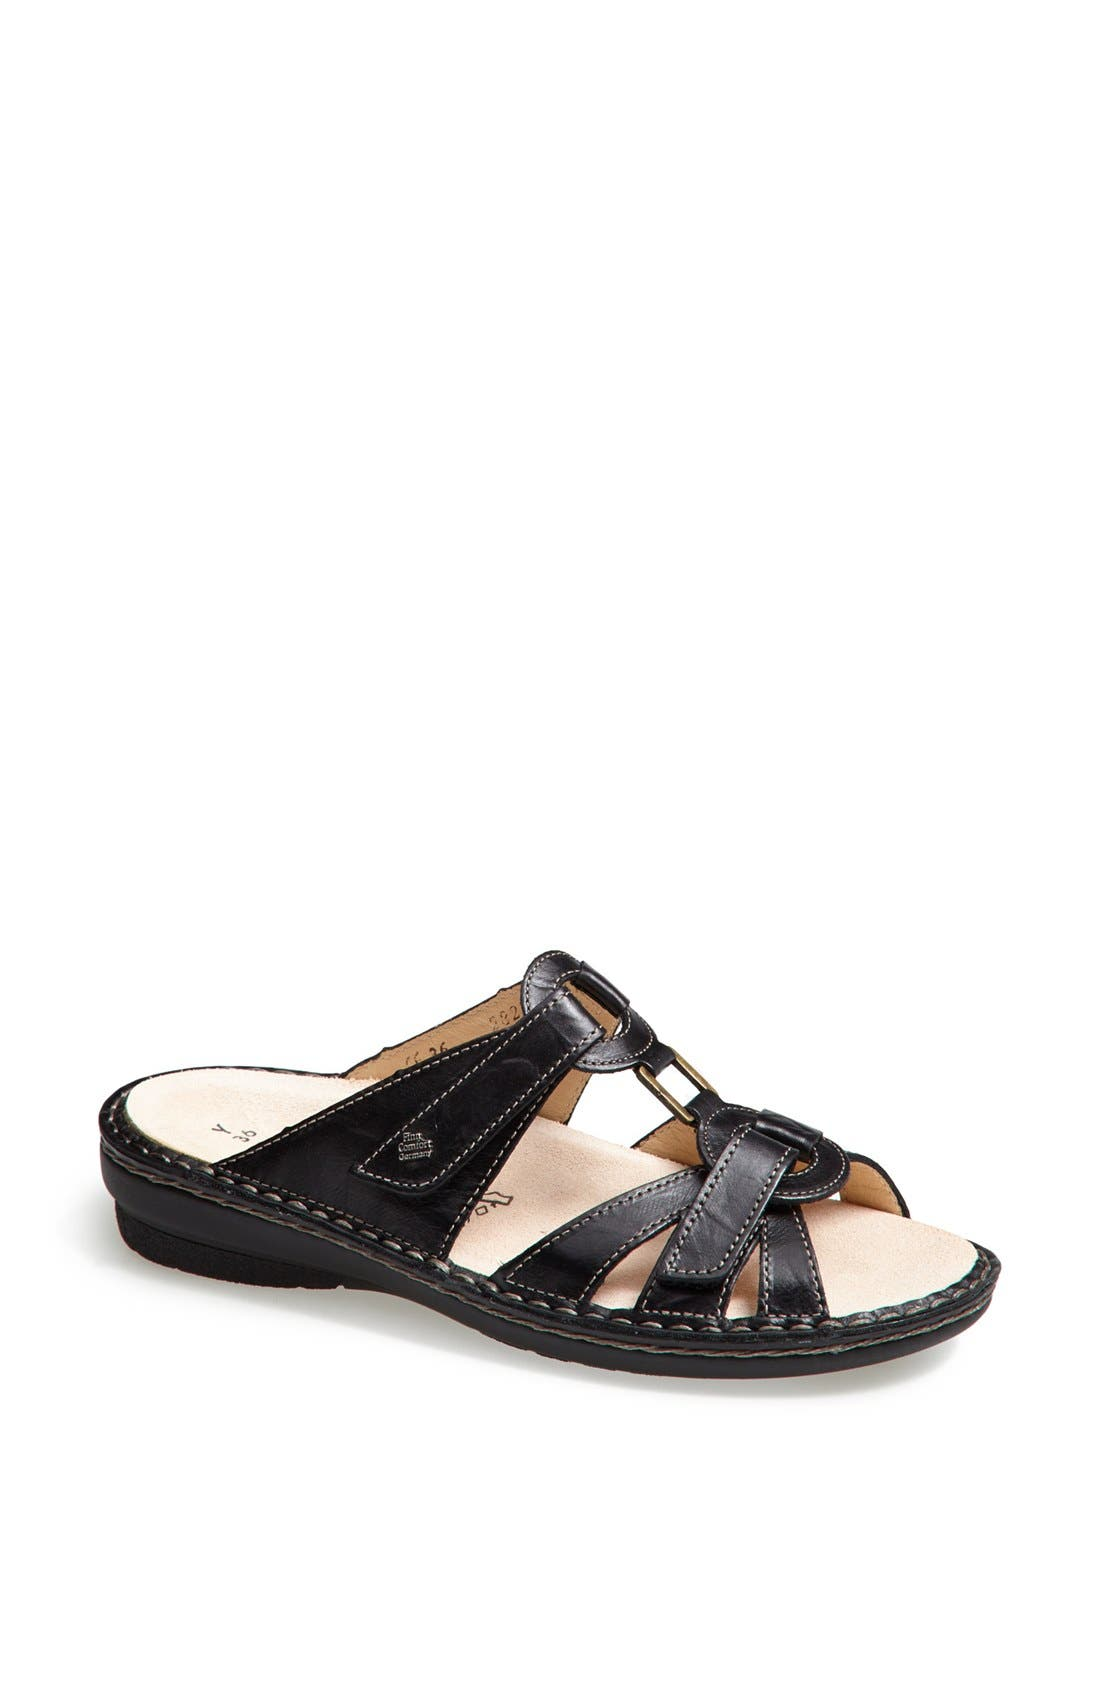 Alternate Image 1 Selected - Finn Comfort 'Cebu' Leather Sandal